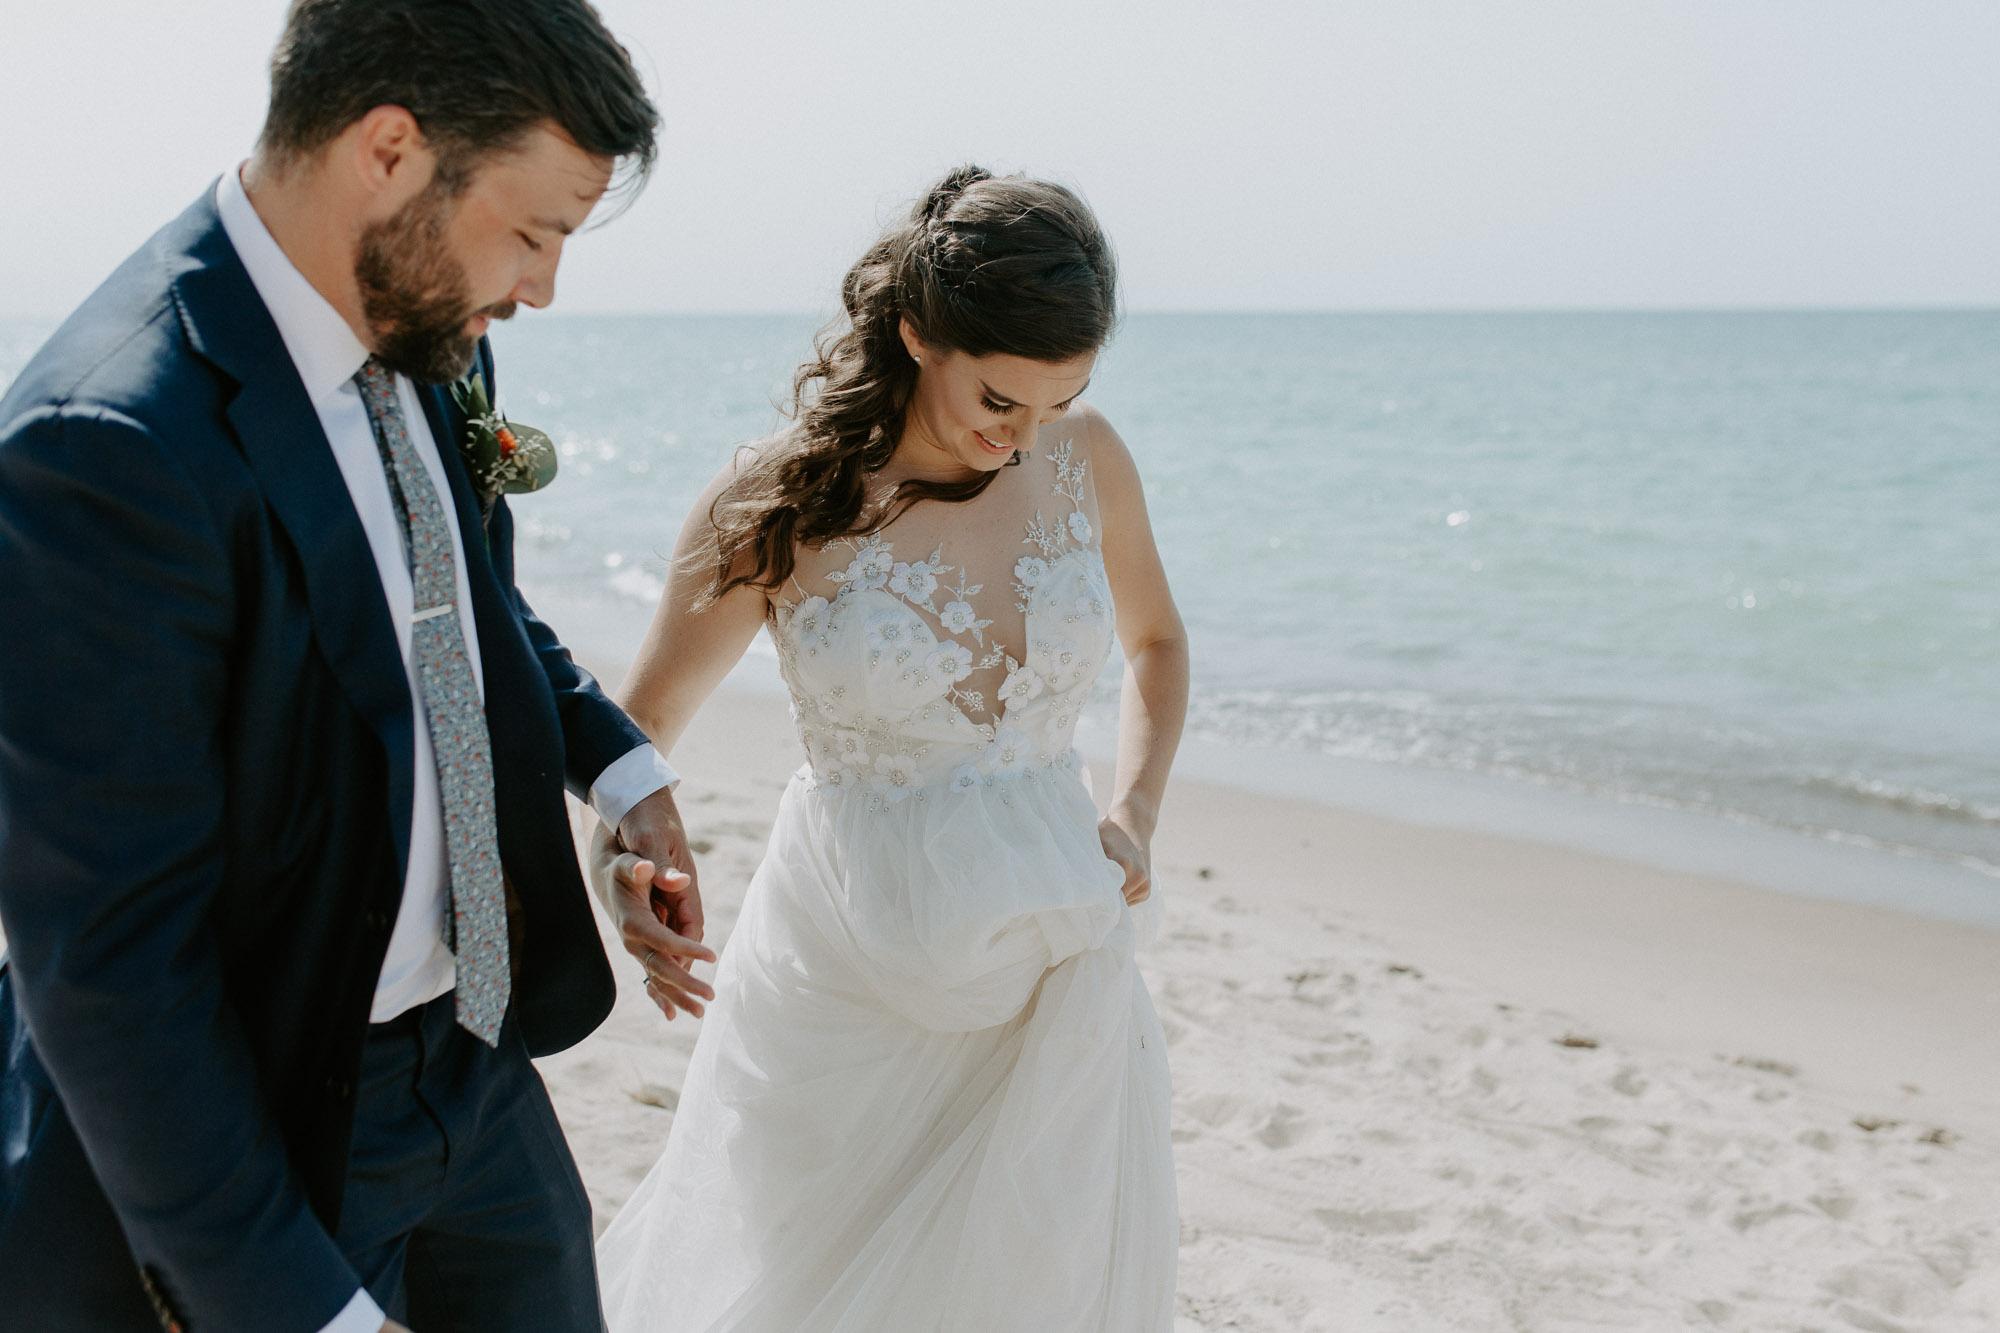 journeyman_distillery_wedding_photographer_chicago_il_wright_photographs-2934.jpg